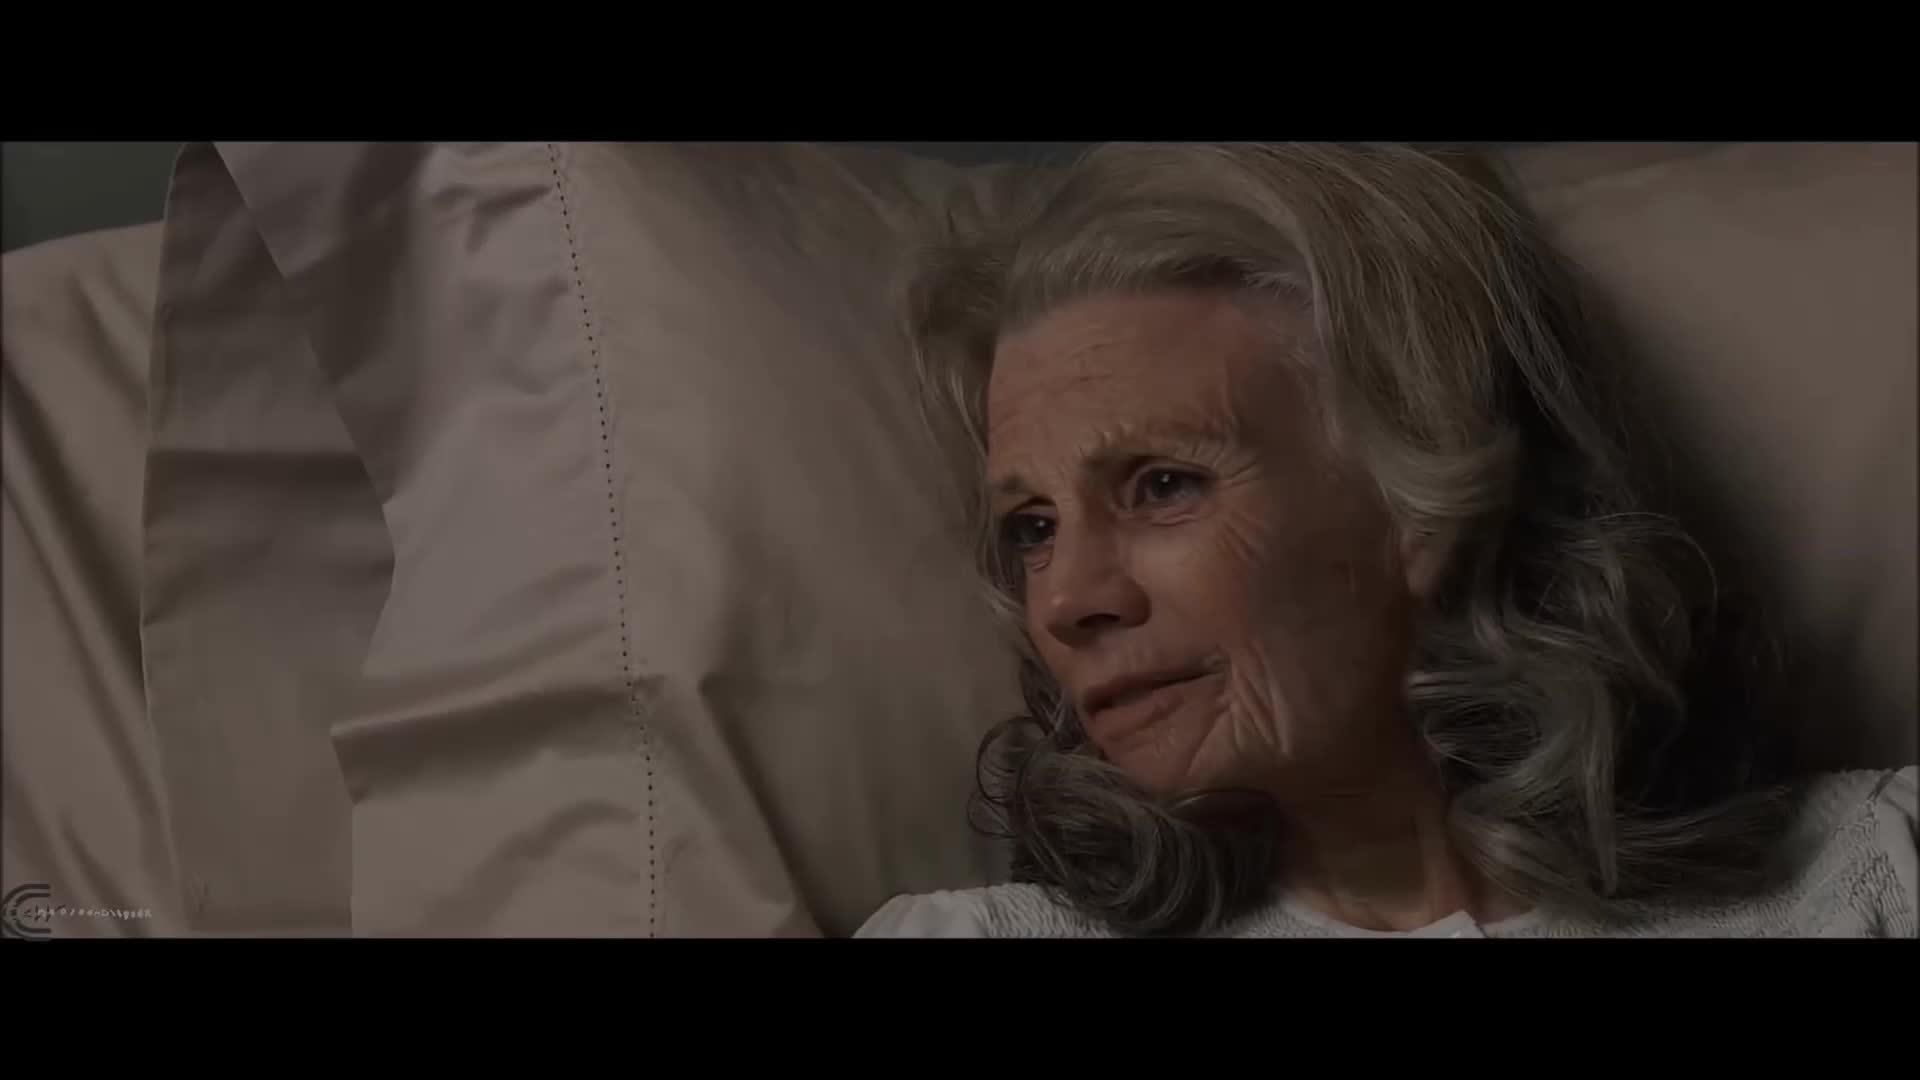 Captain America gặp lại Peggy Carter sau 70 năm (Captain America: The Winter Soldier - 2014)